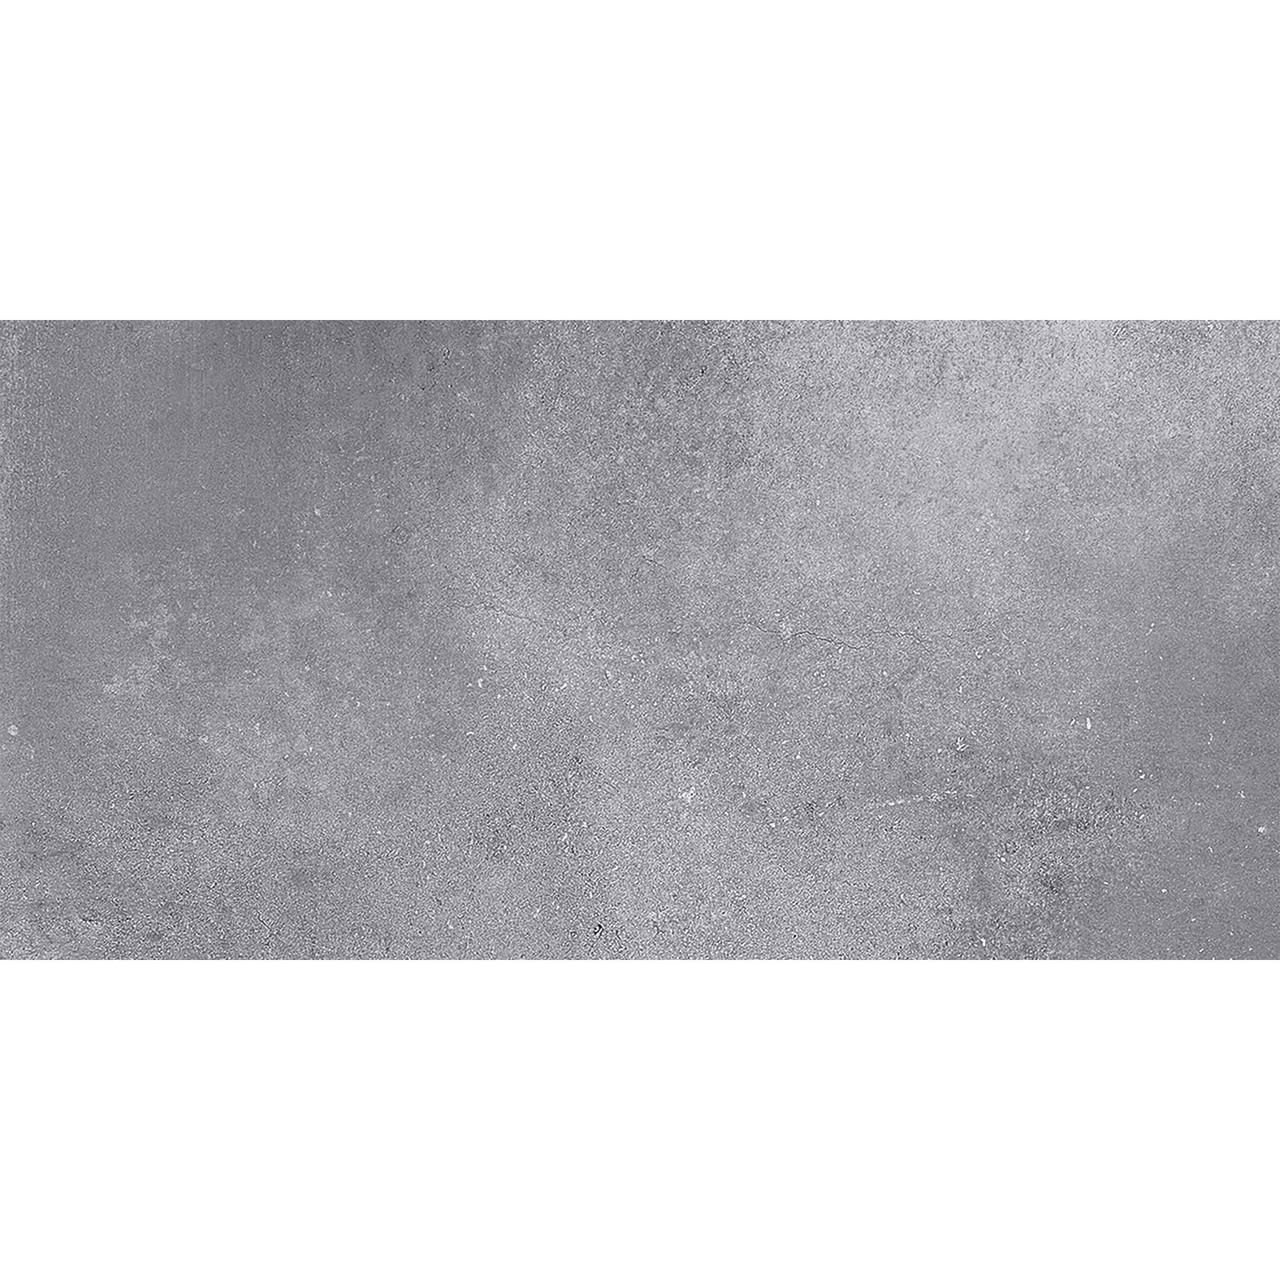 Керамогранит КИП КЕРАМИКА ASKANITE NATURAL Актуал серый арт.(410613)